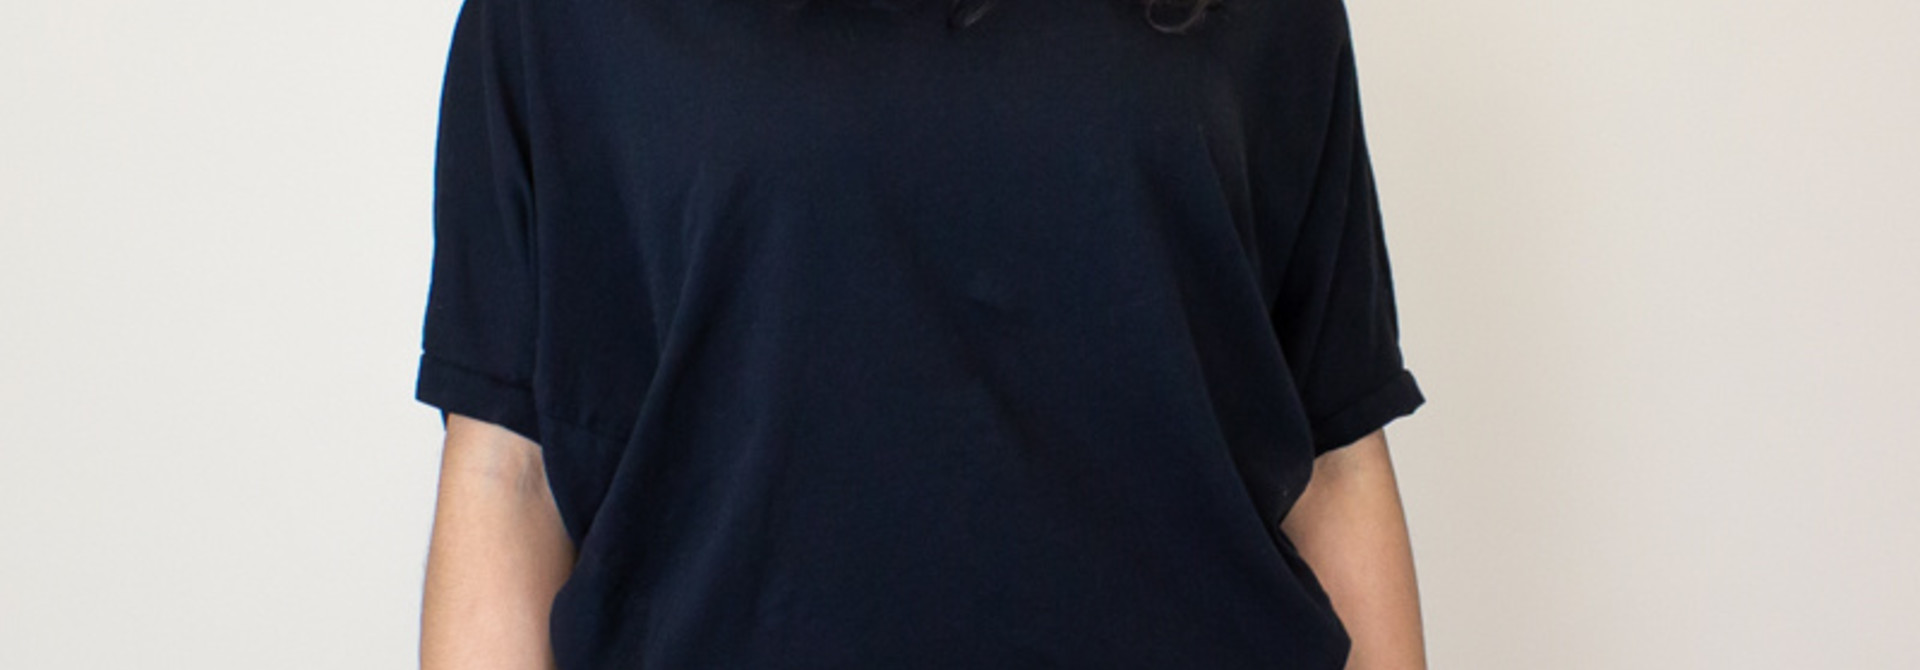 Comune Winger T-Shirt - Black